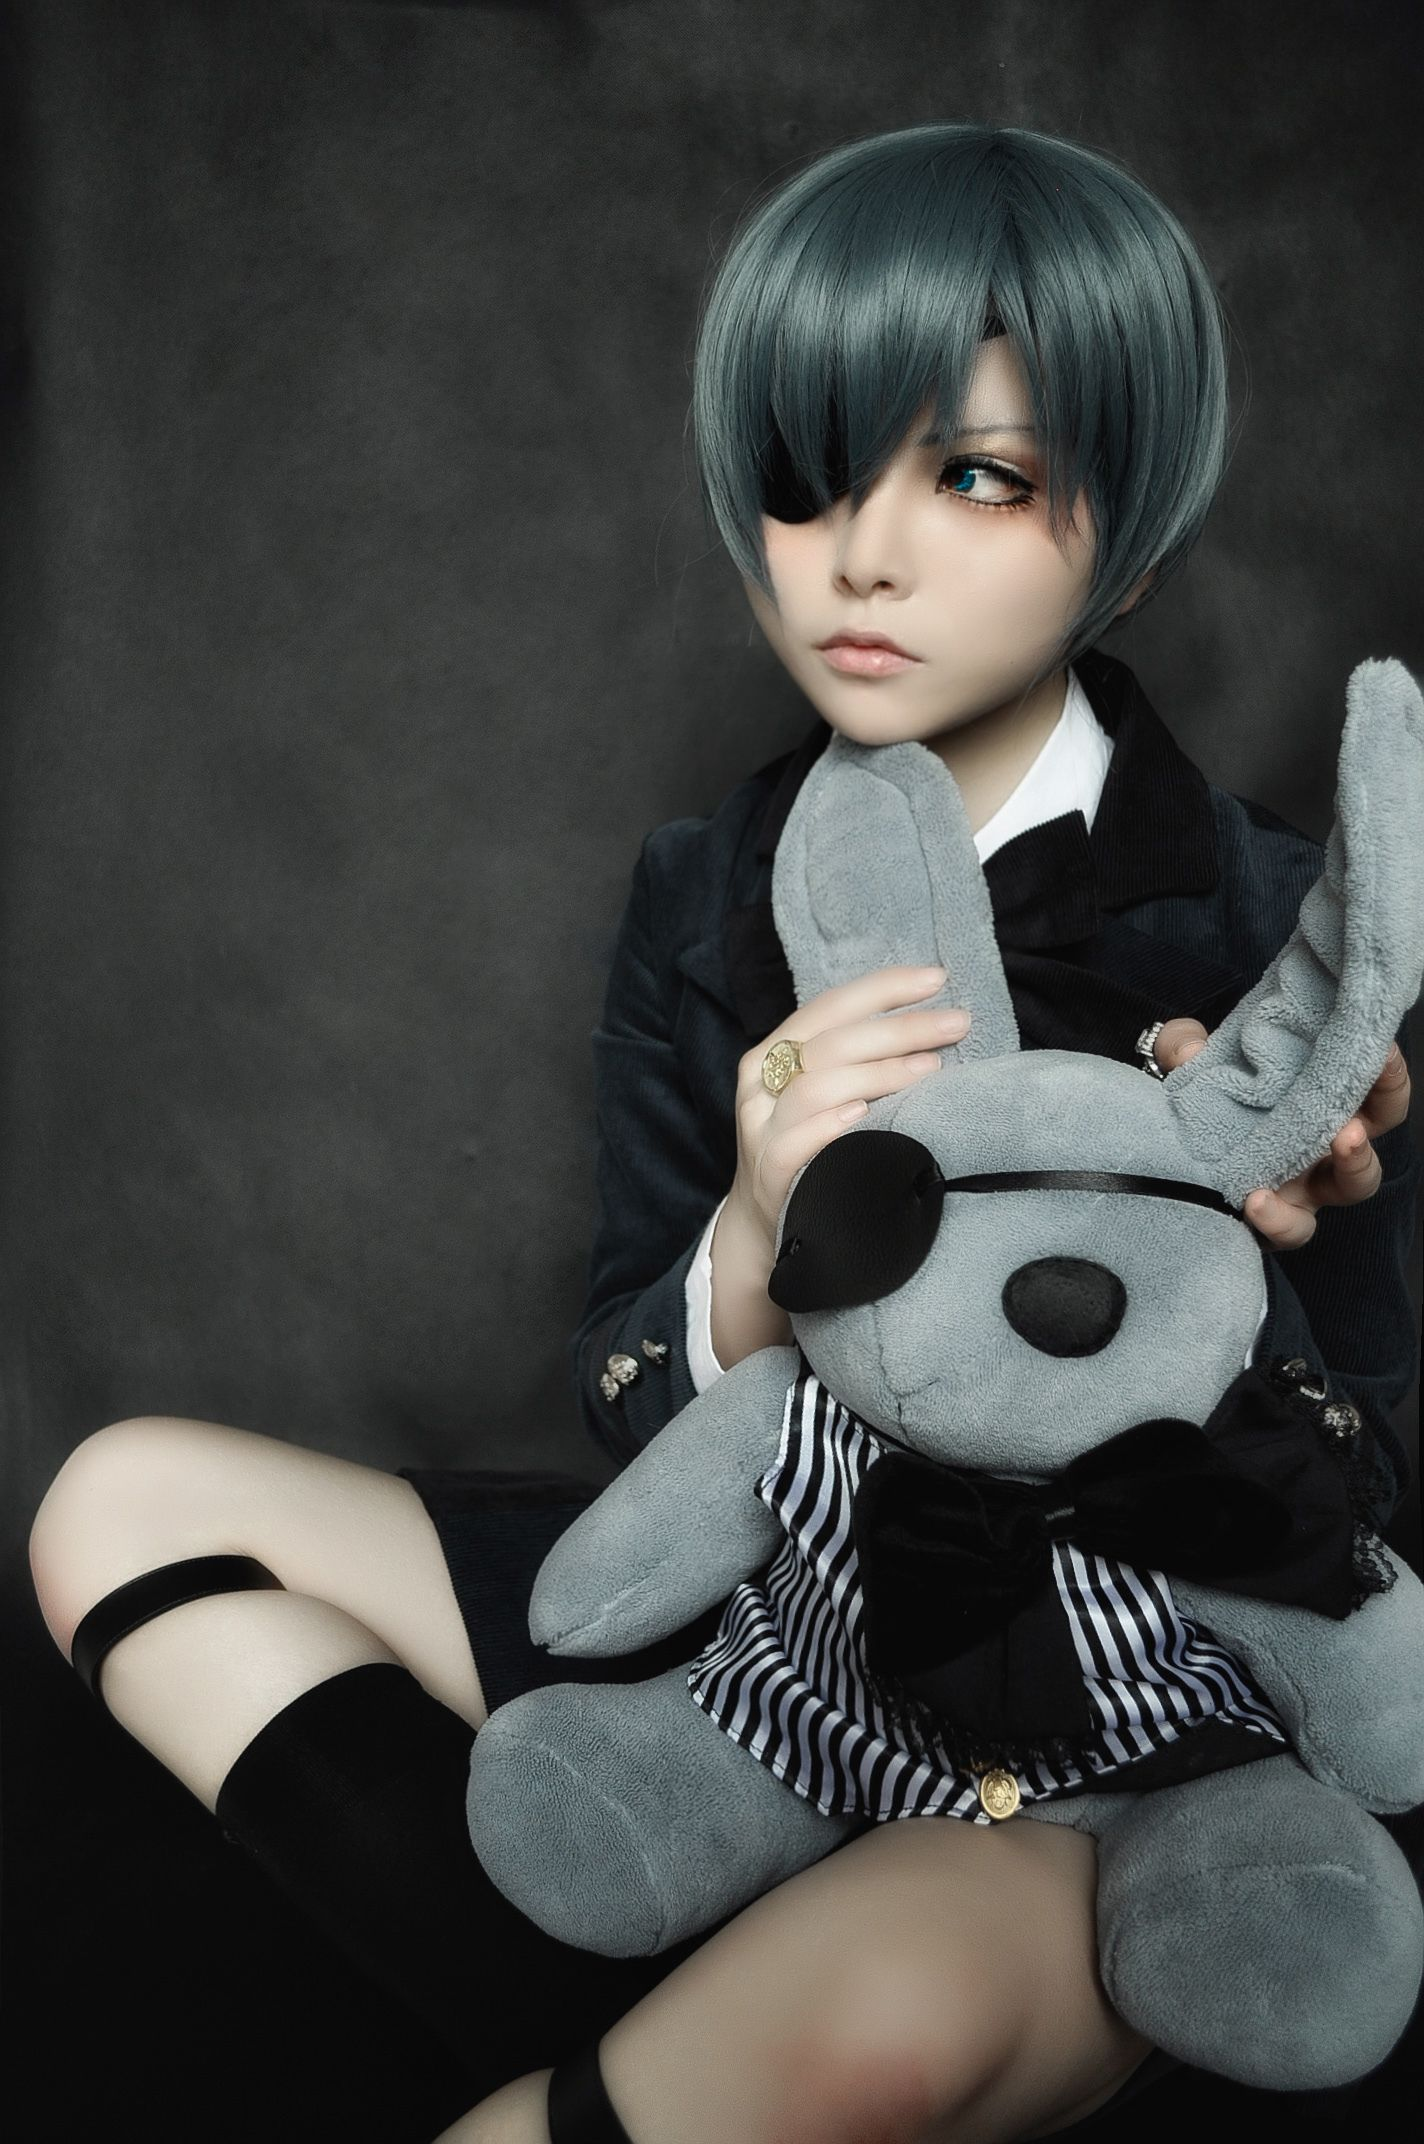 CIEL likyosan(米线菌) Ciel Phantomhive Cosplay Photo Cure